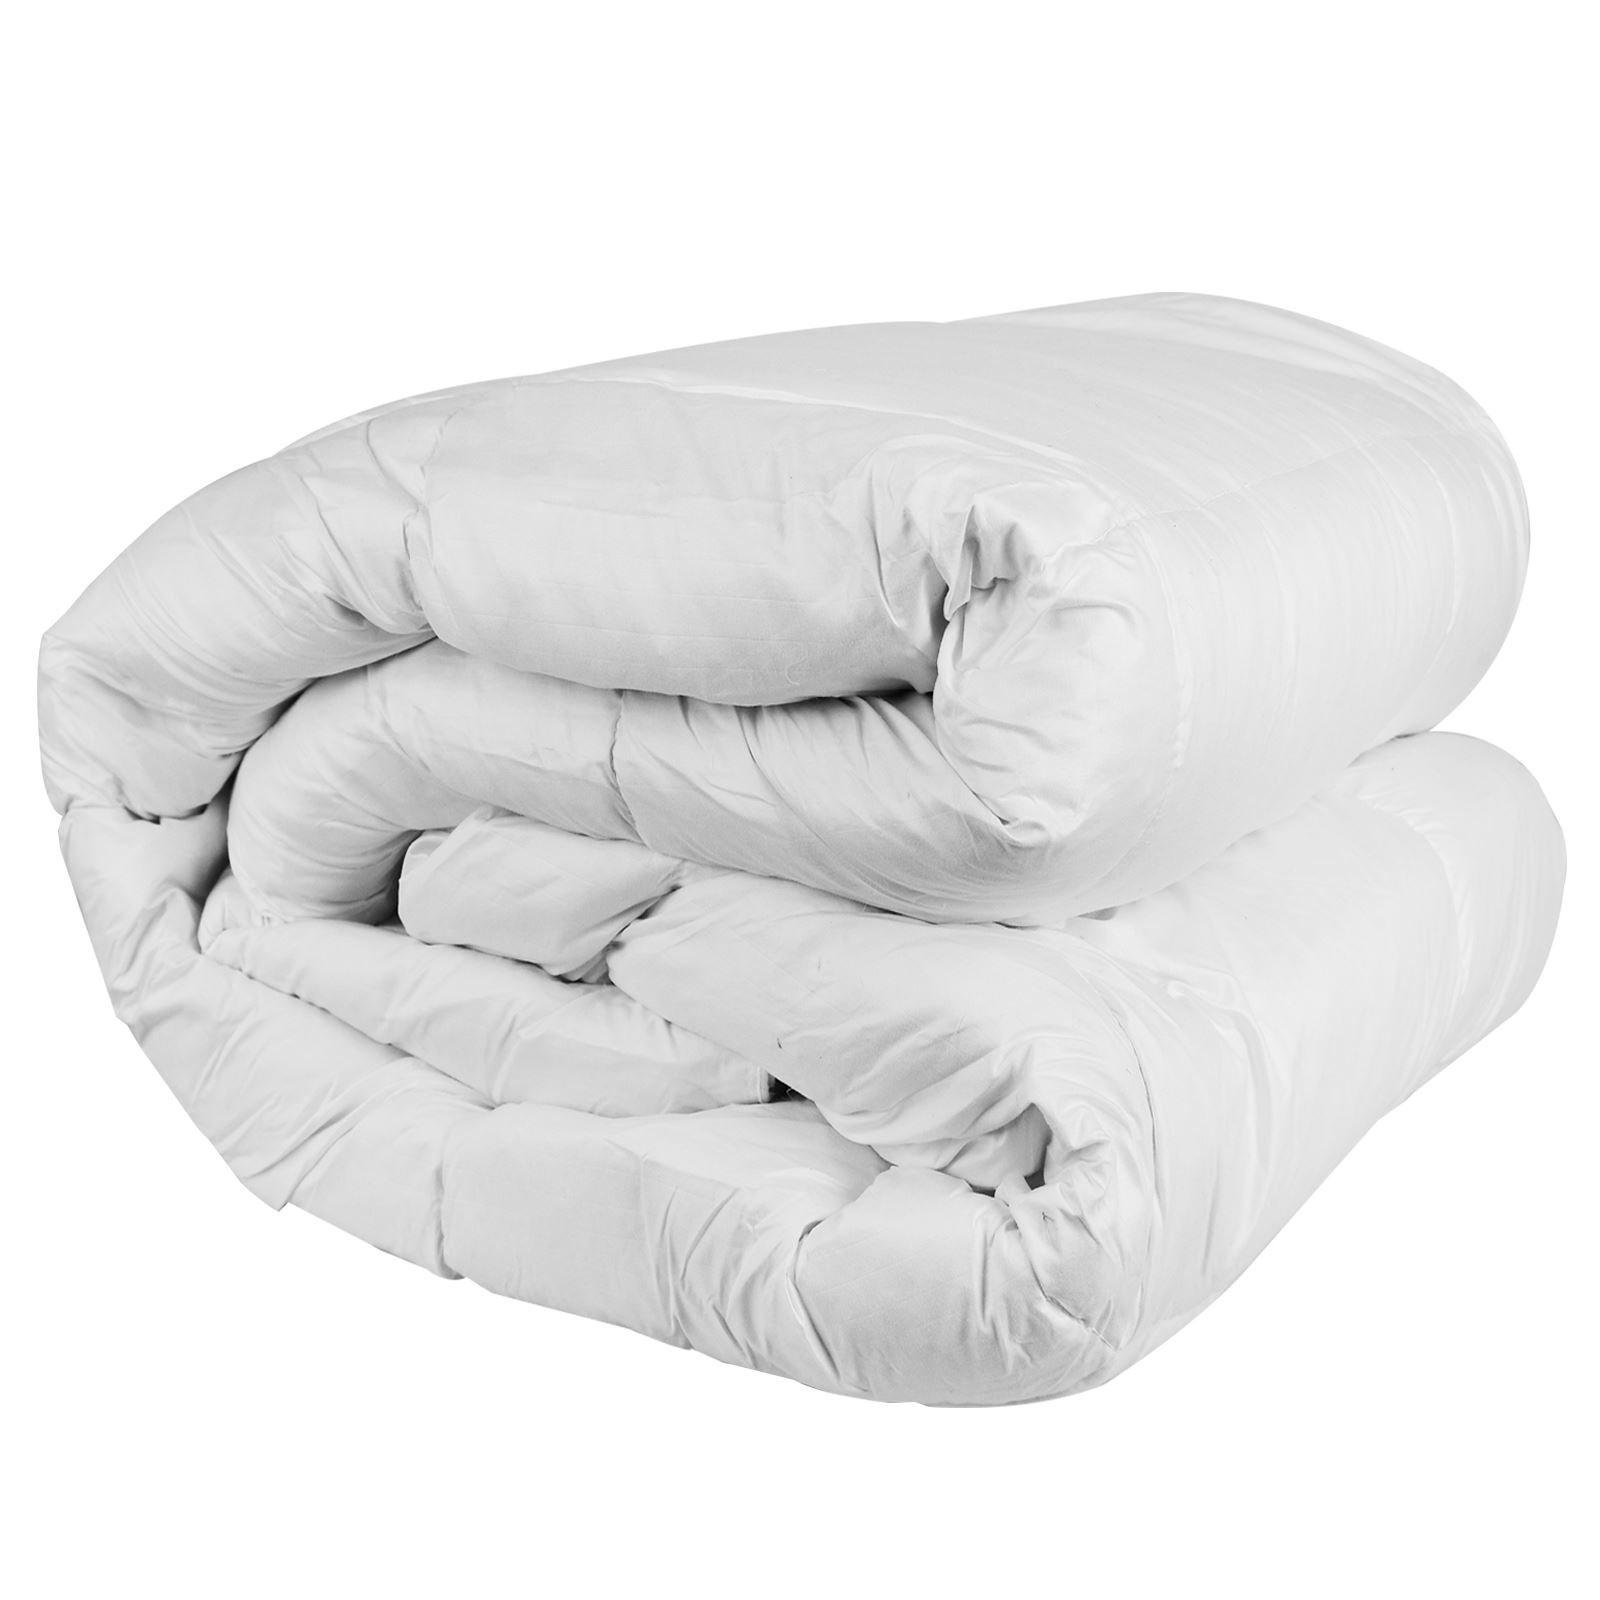 Lujo-Pluma-De-Pato-Abajo-Edredon-Ropa-De-Cama-Edredon-relleno-confortable-13-5-15-Tog miniatura 16